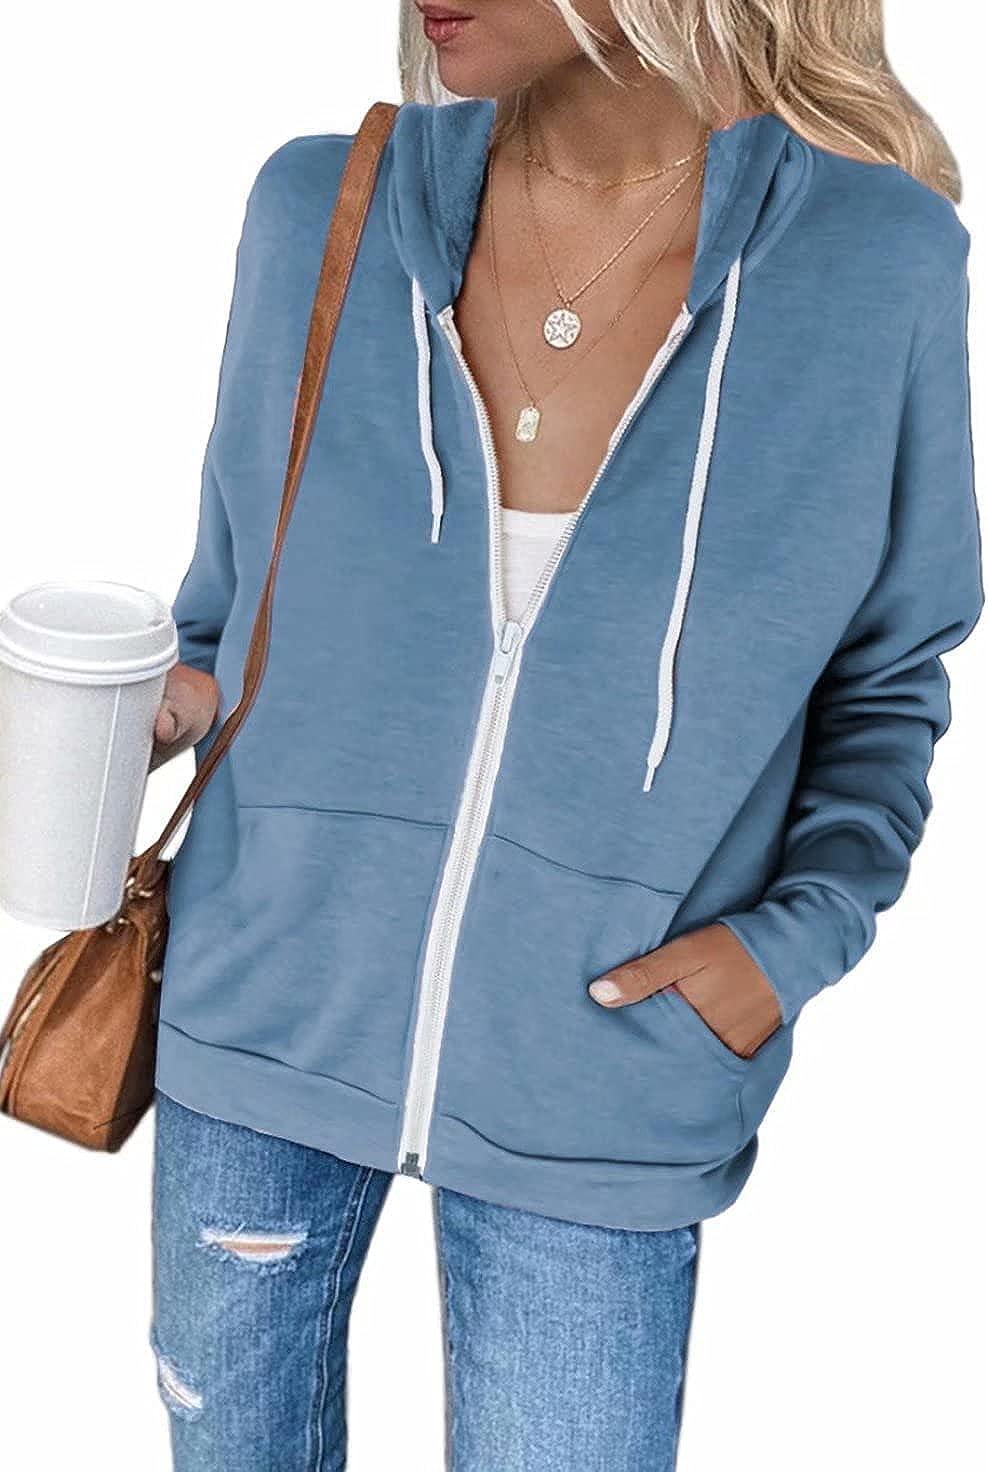 LAFOURAM Womens Zip Up Long Sleeve Hoodies Jackets Casual Hooded Sweatshirt Coat